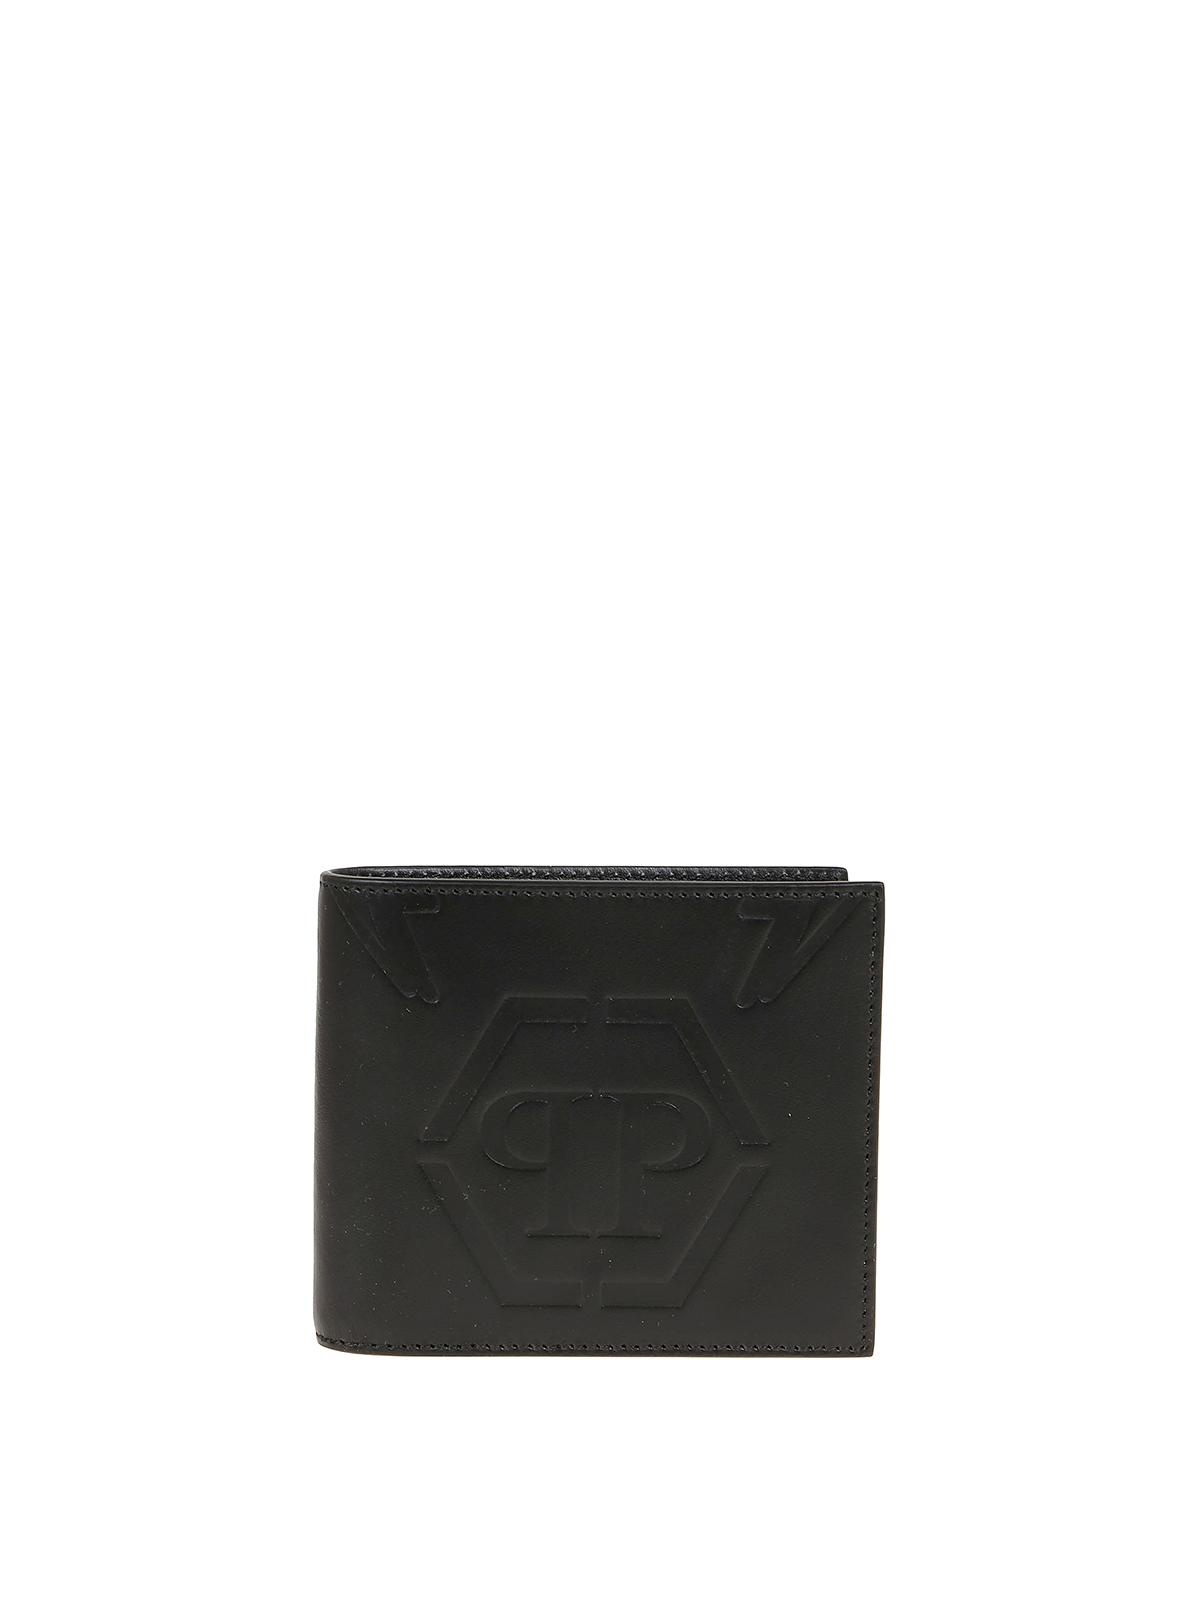 Philipp Plein Branded Bi-fold Wallet In Black